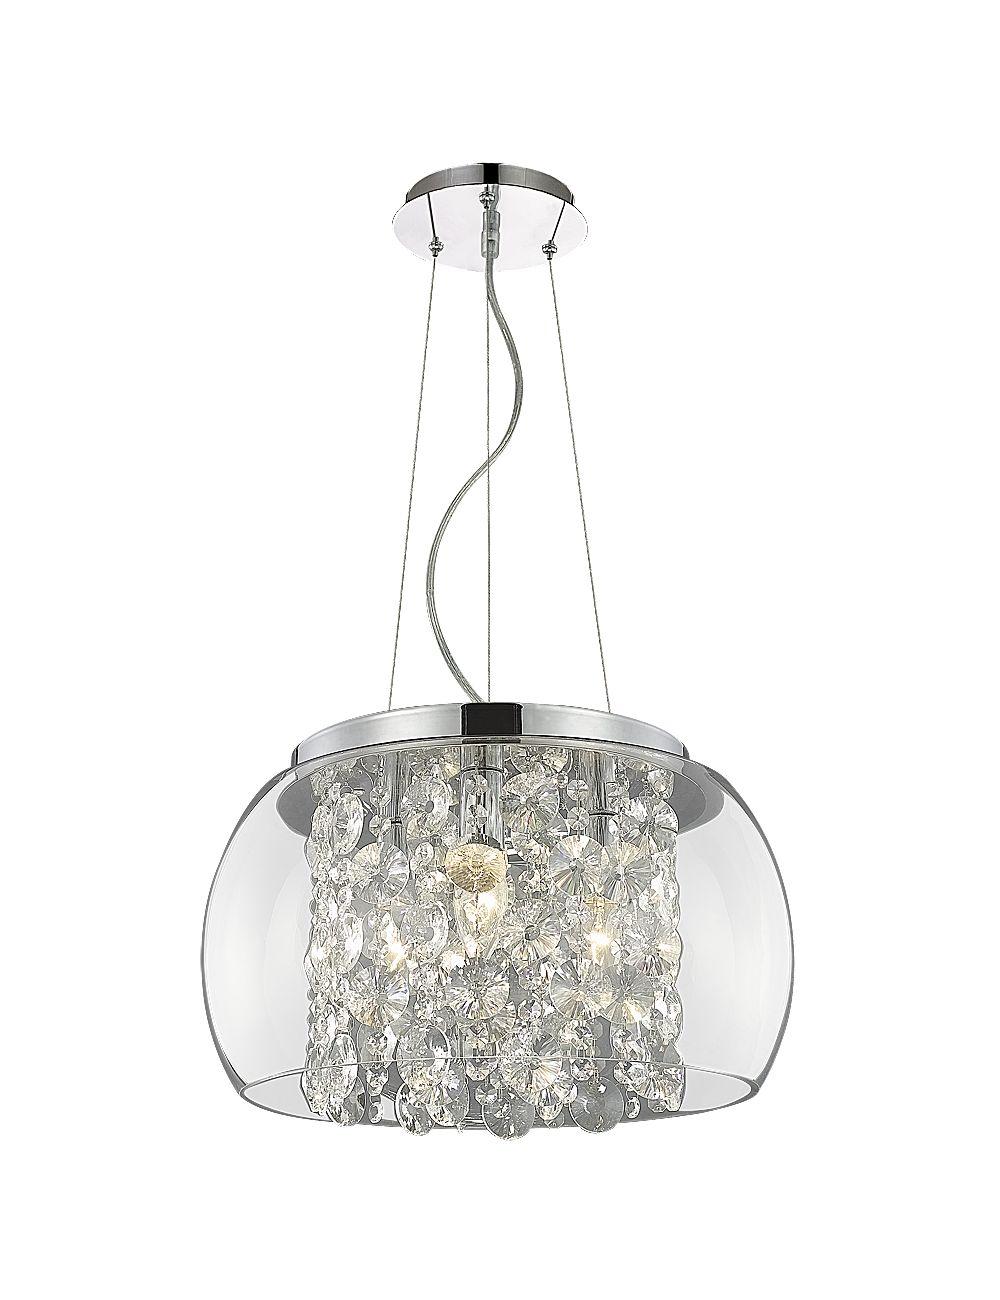 Rabaty!!! 2820 Brillant lampa wisząca szklana Rabalux